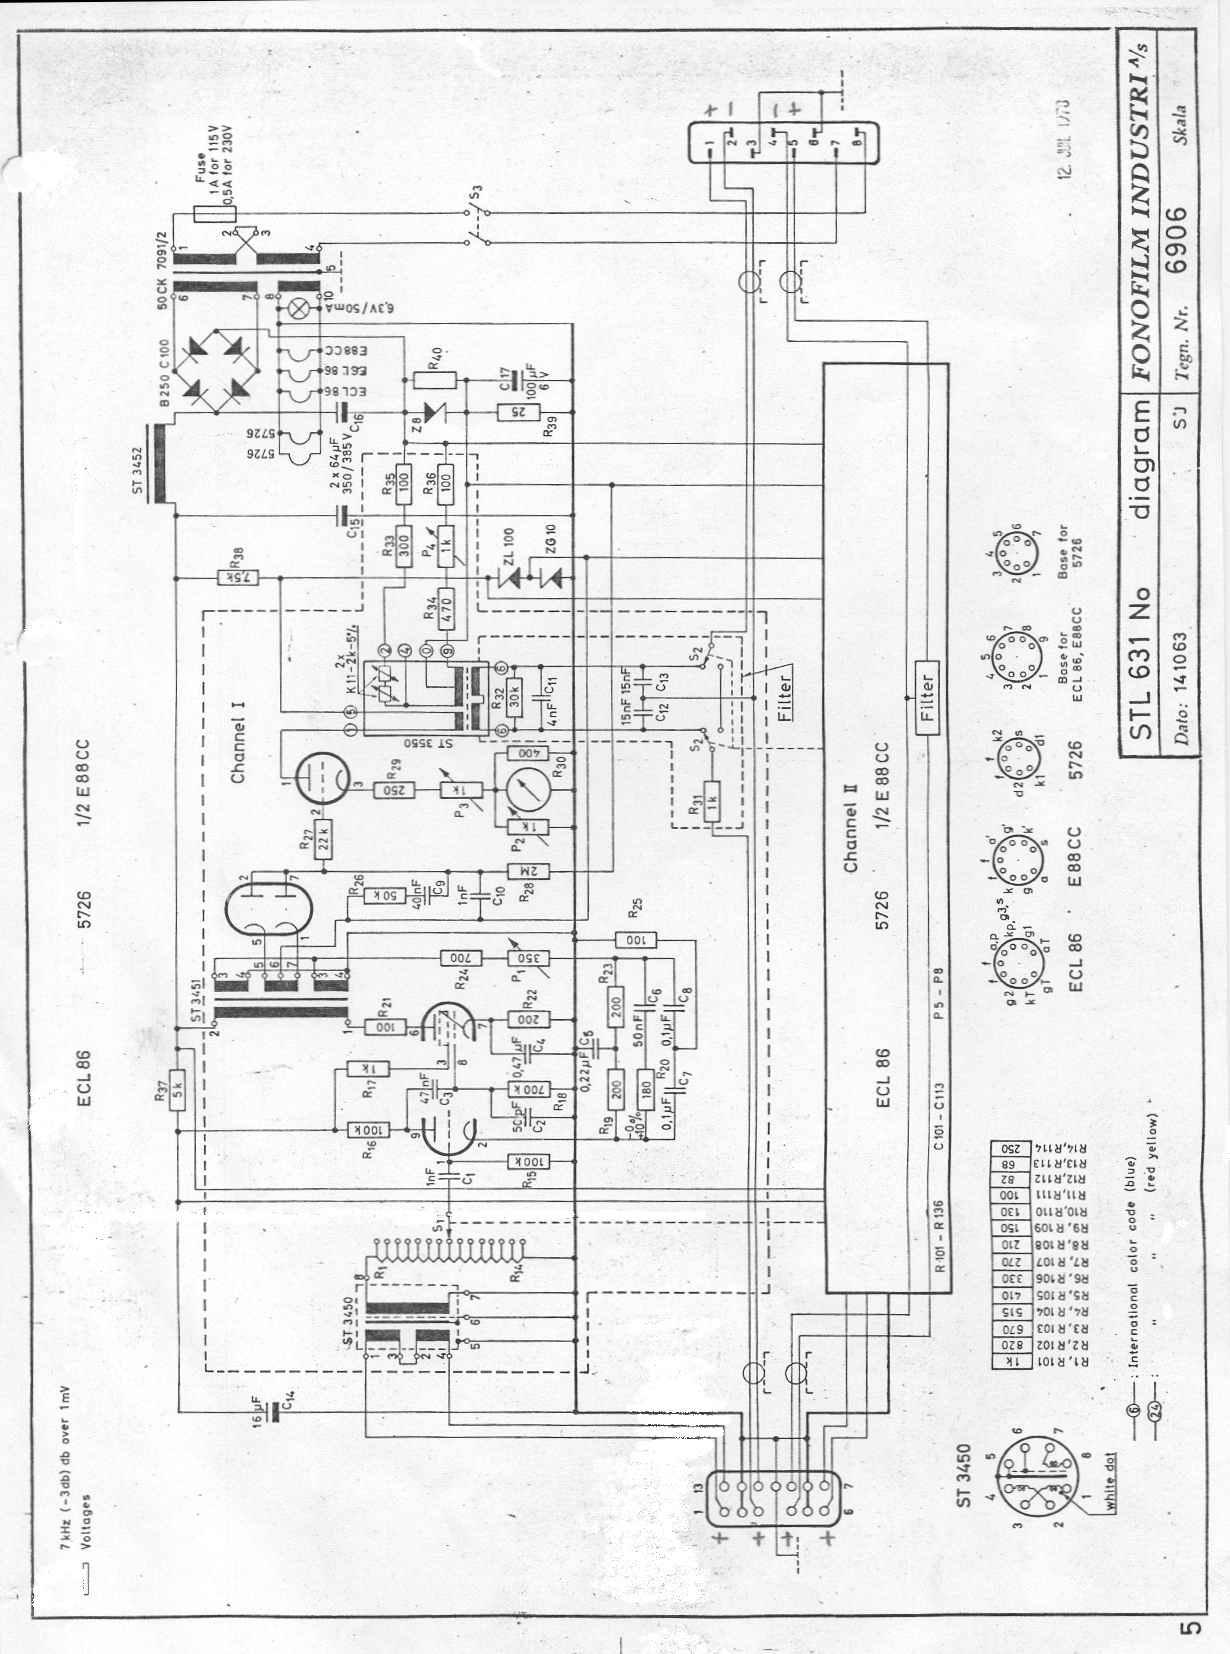 Vintage Mastering Room Build